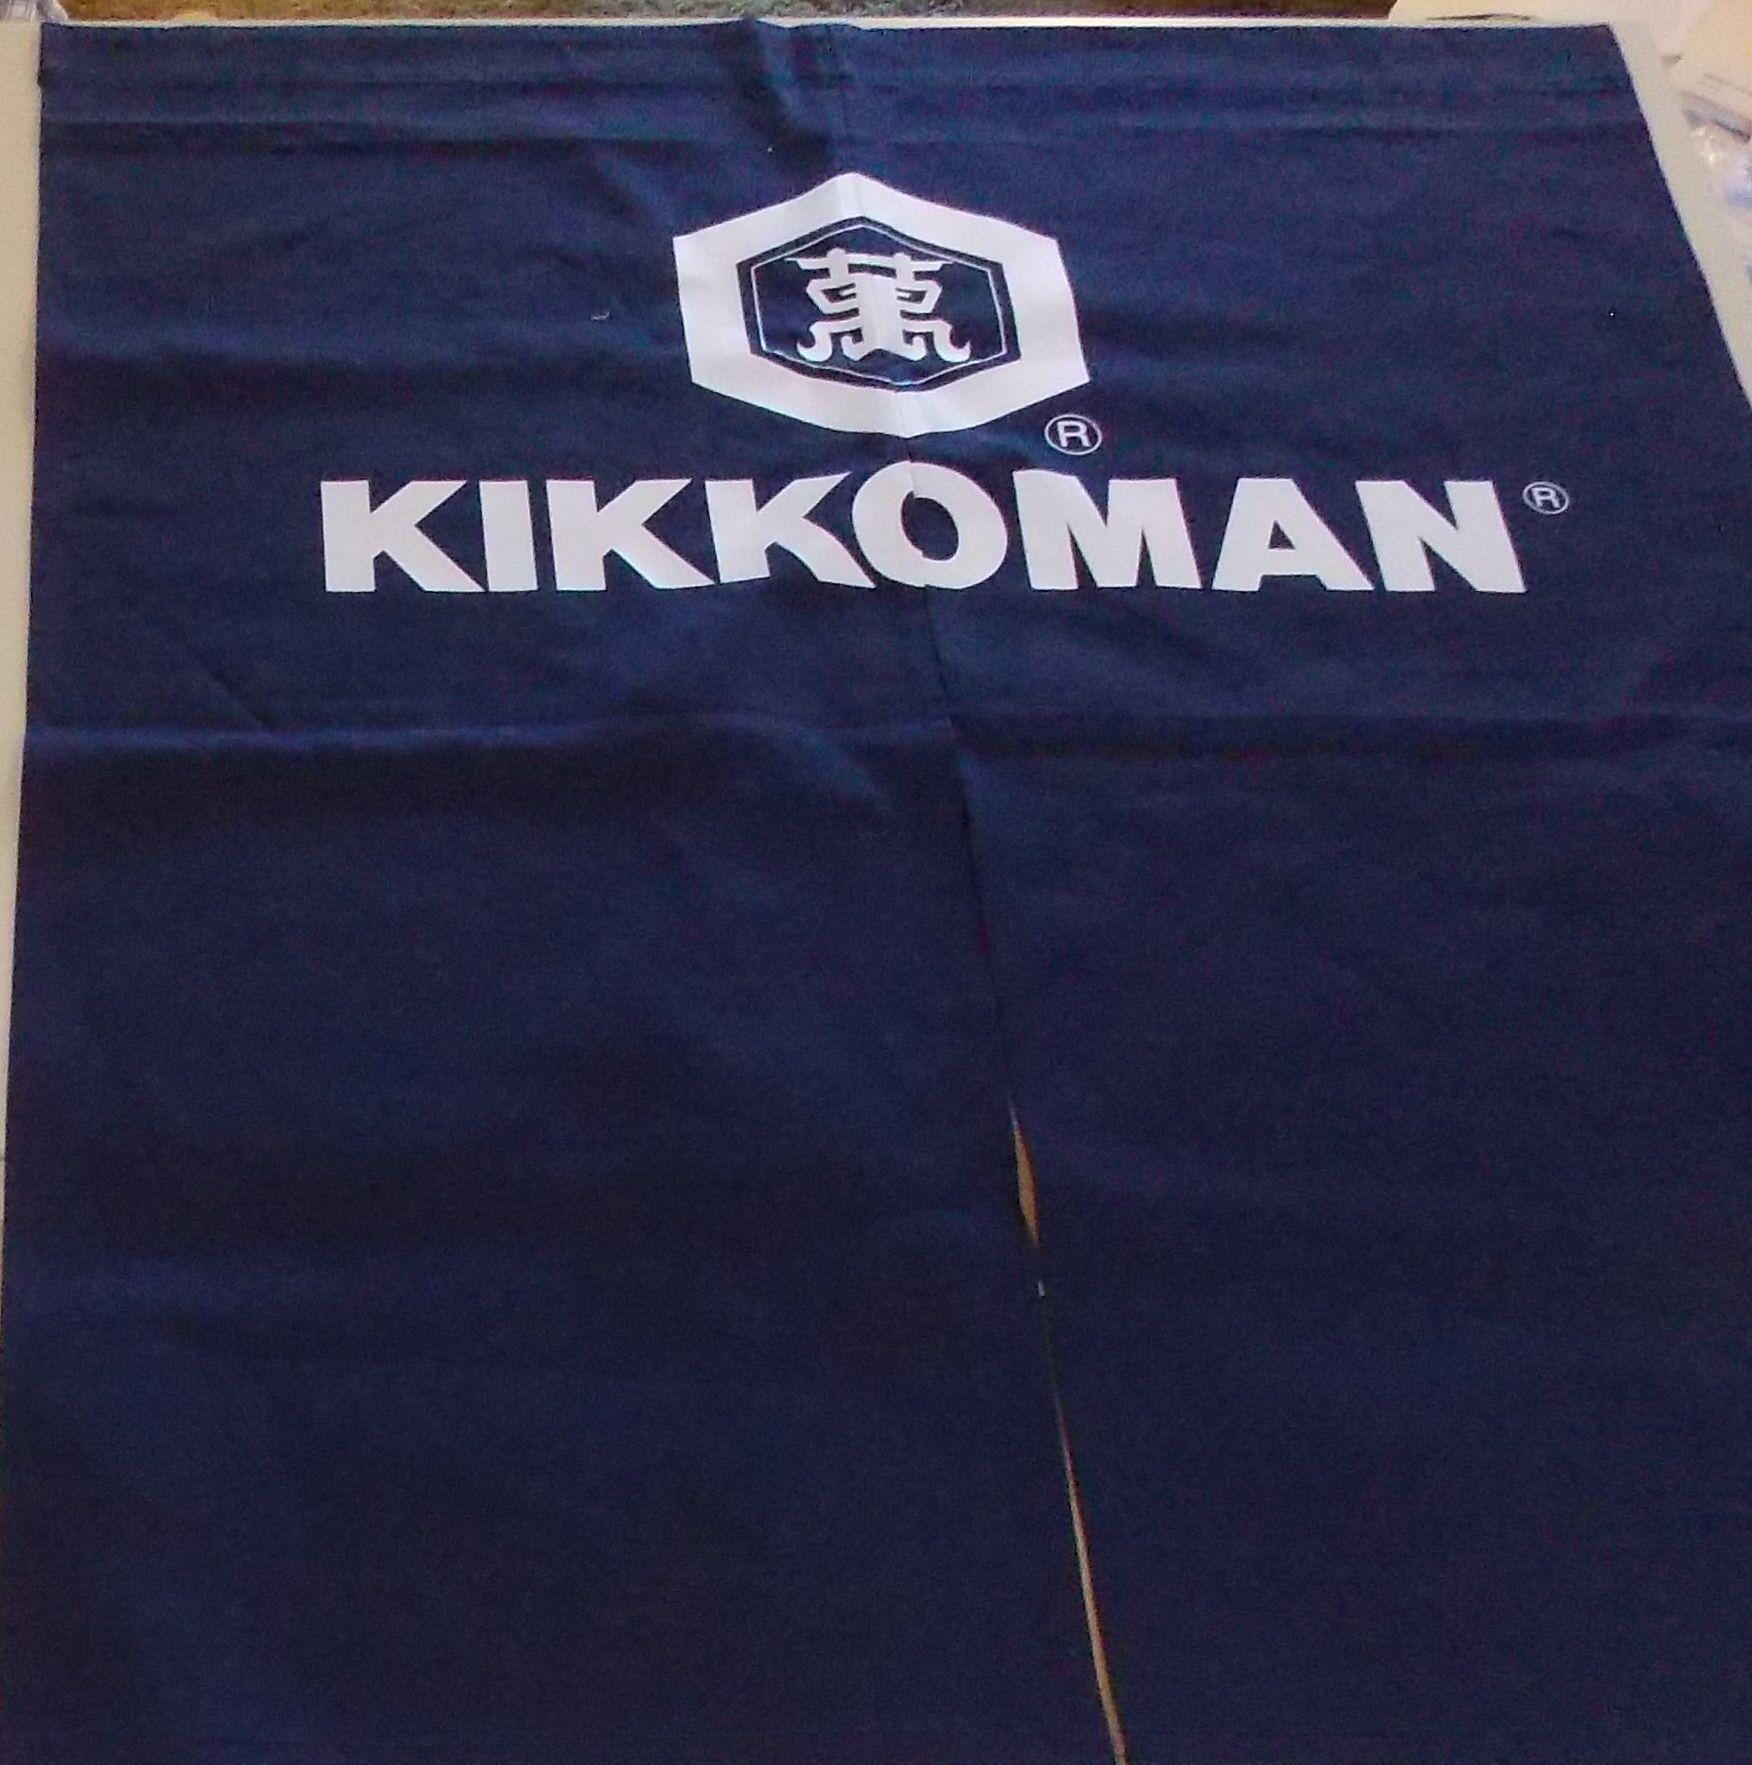 Custom Order Noren Curtain Male Kimono Noren Curtains Unique